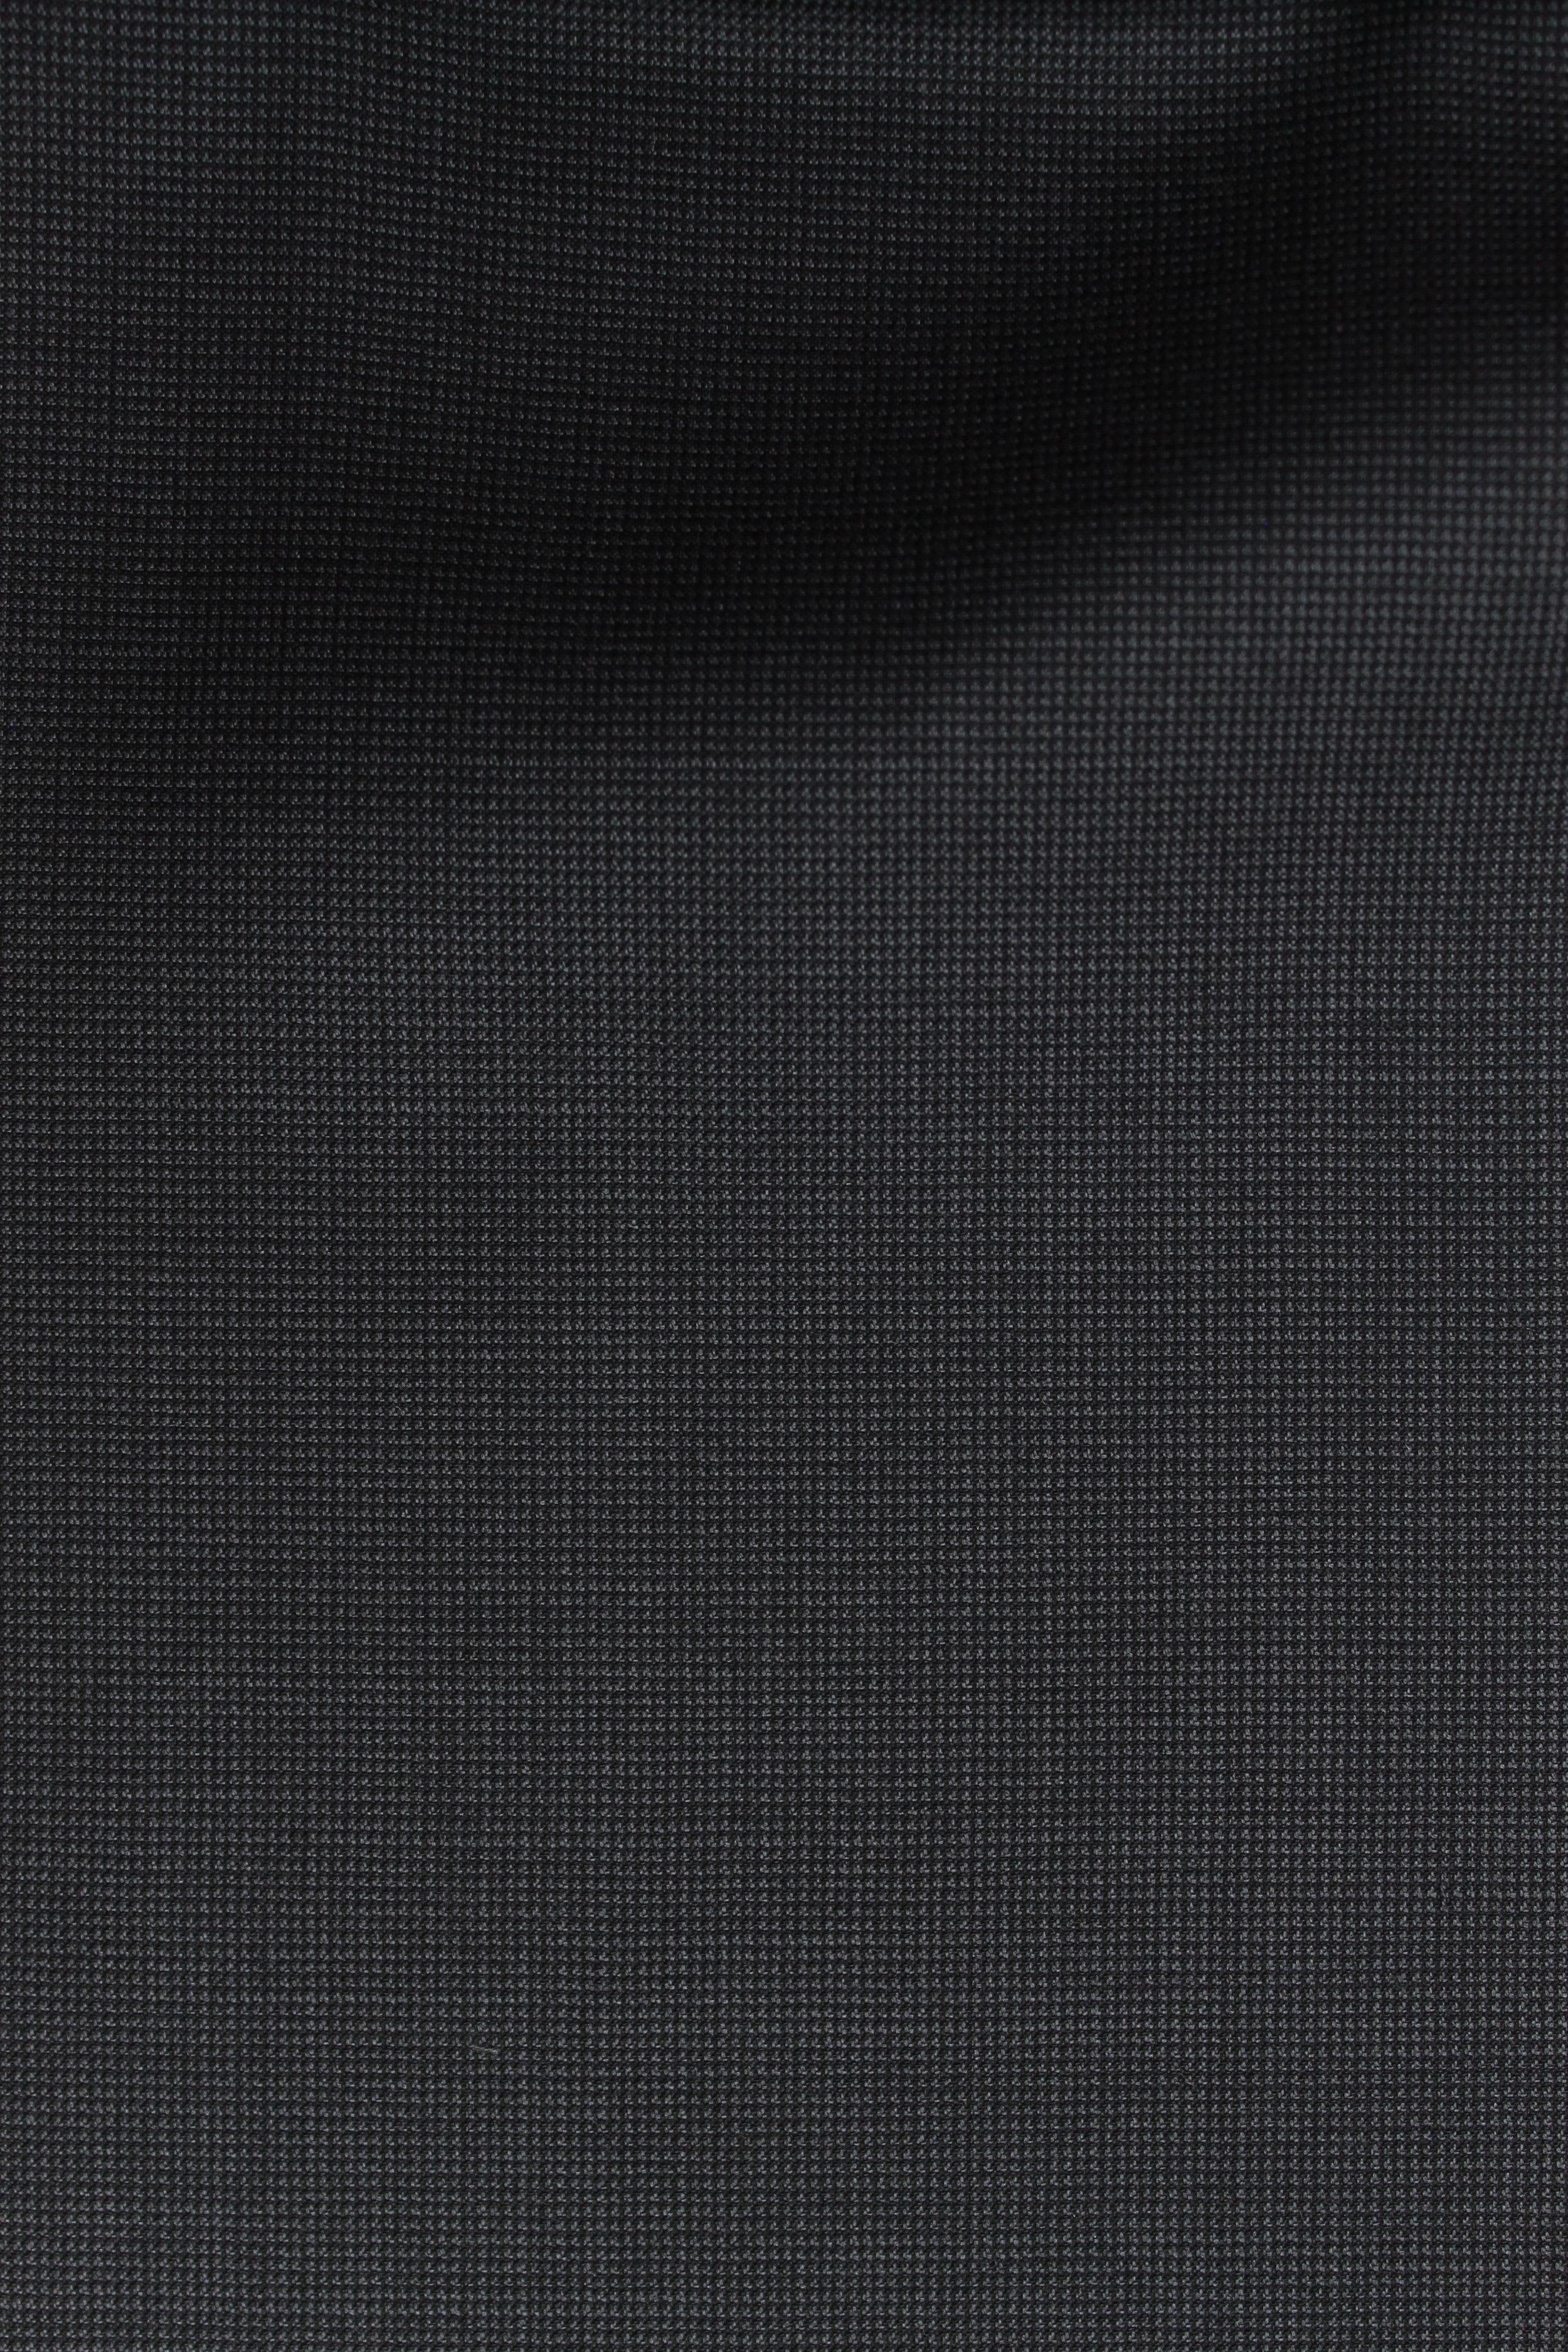 7296 Dark Grey Nailshead 280g.JPG